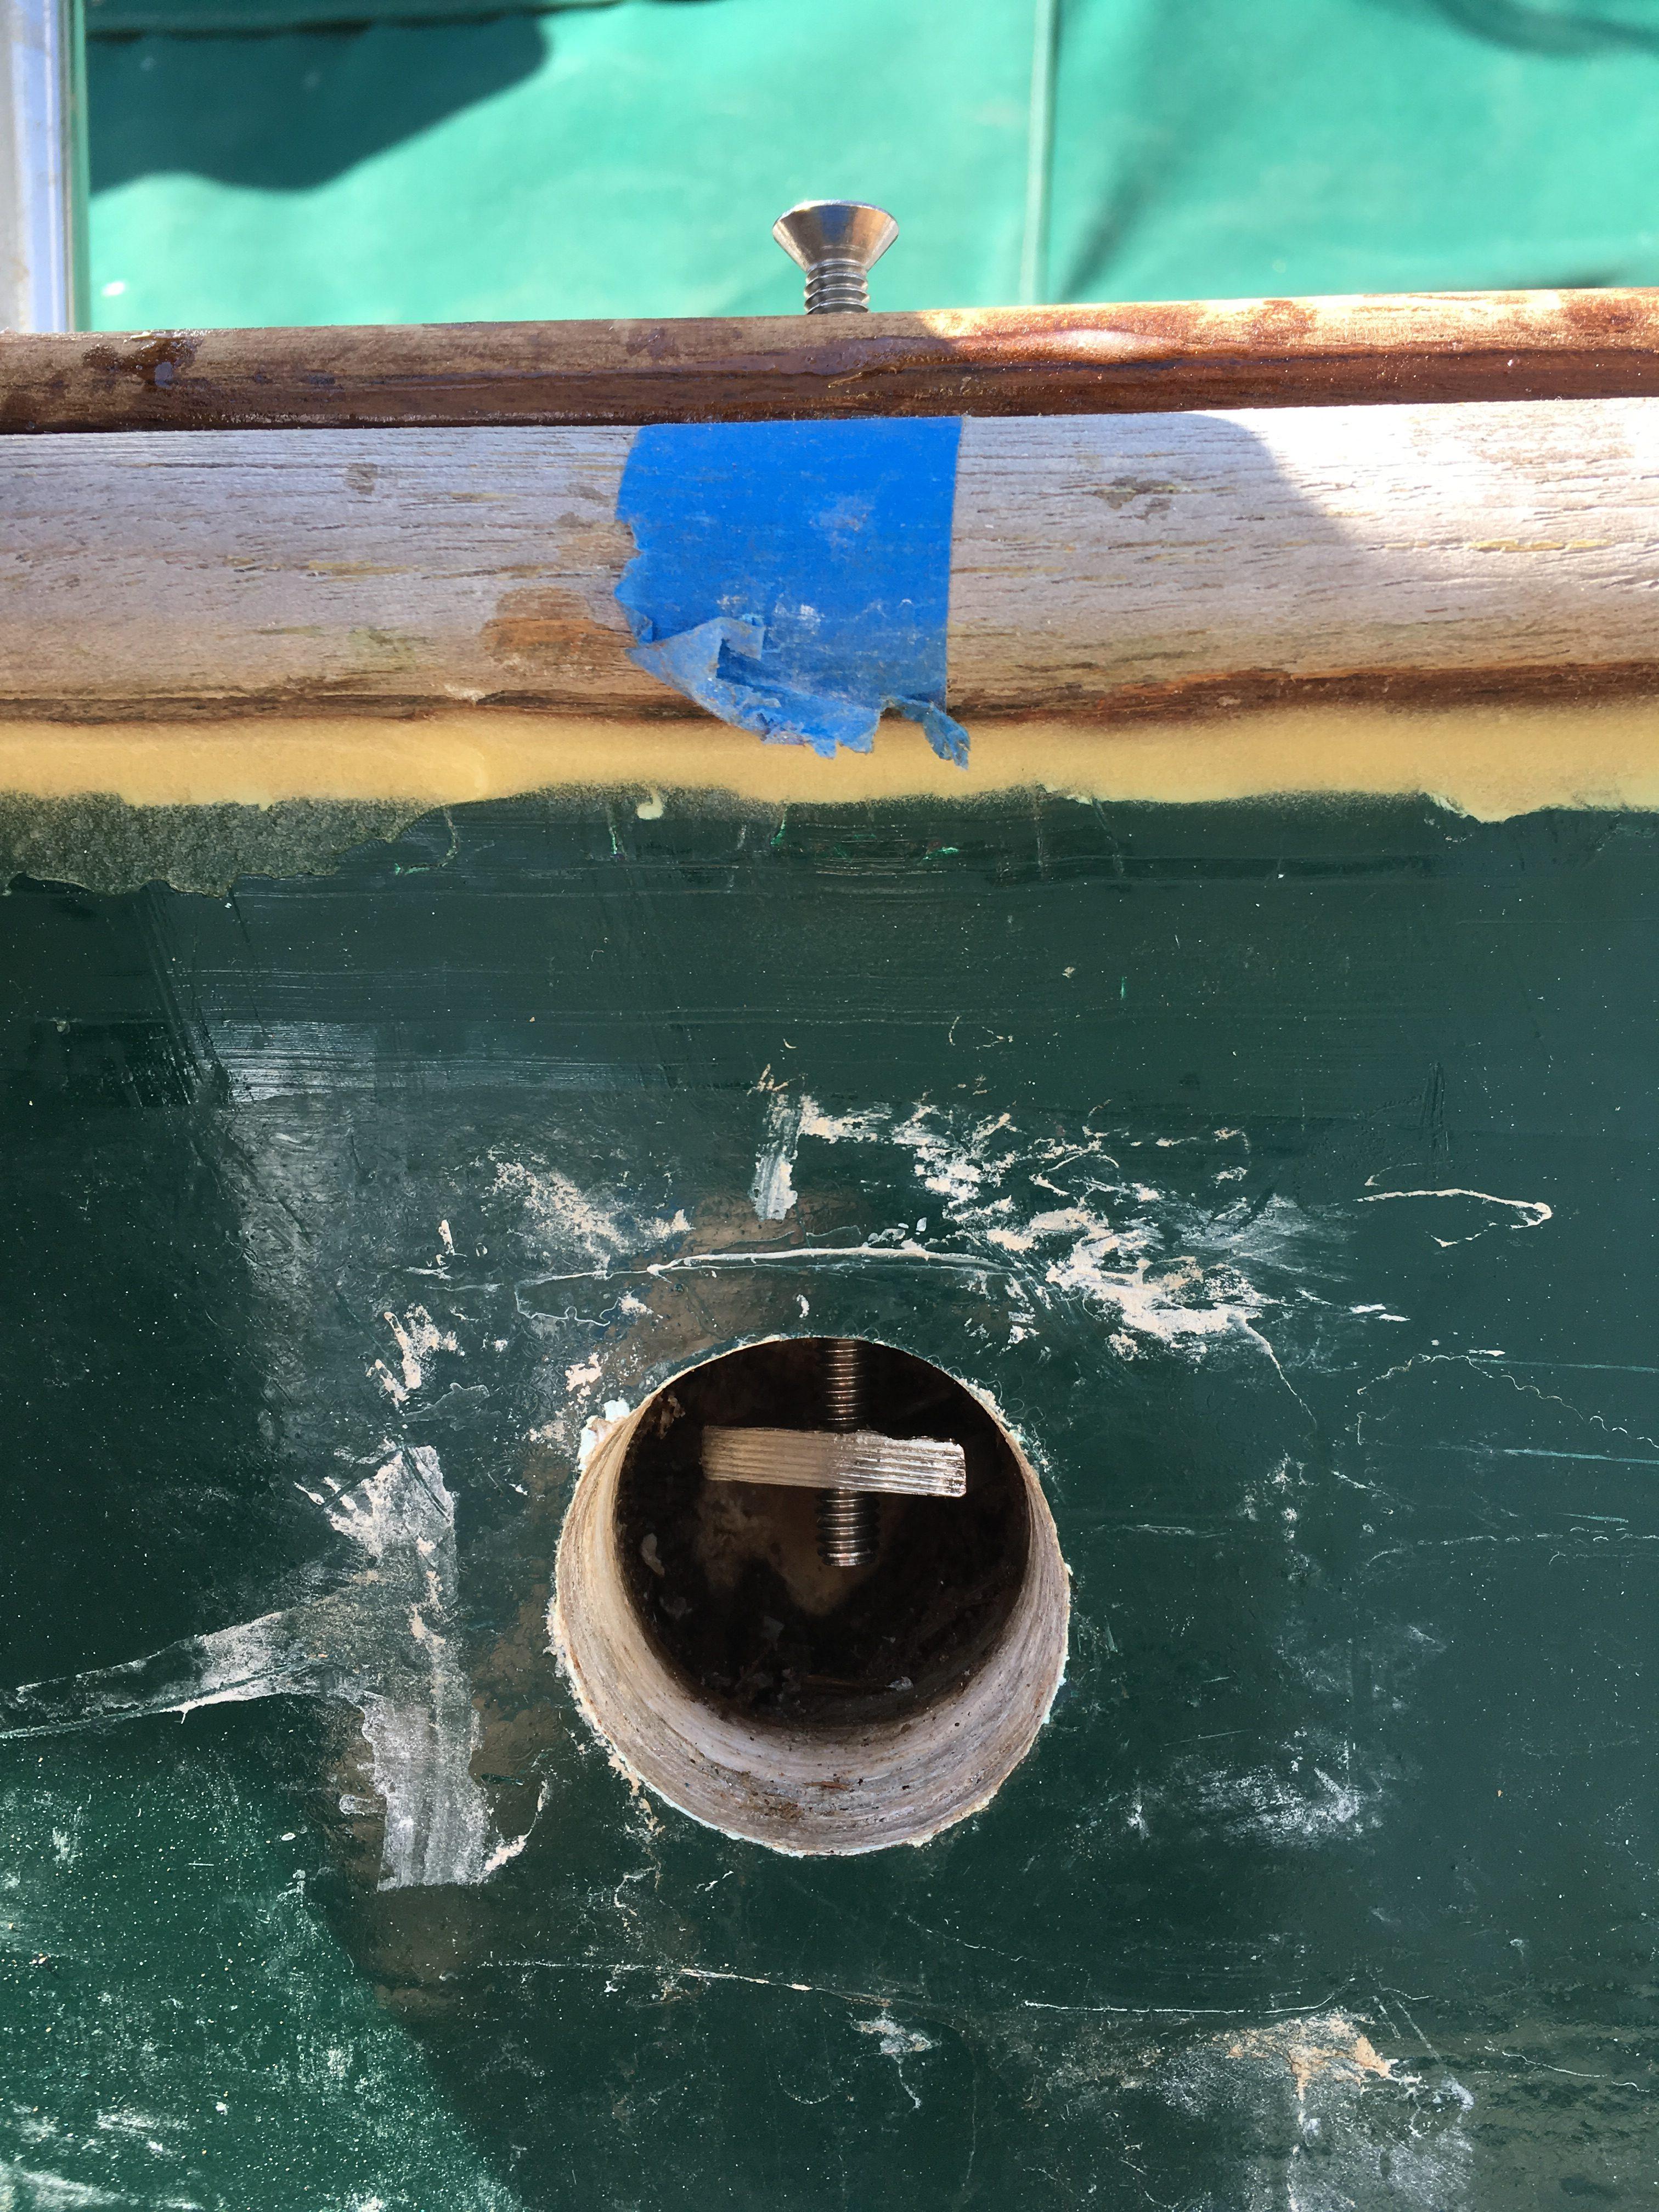 jib track bolt, union 36, leaking bulwarks